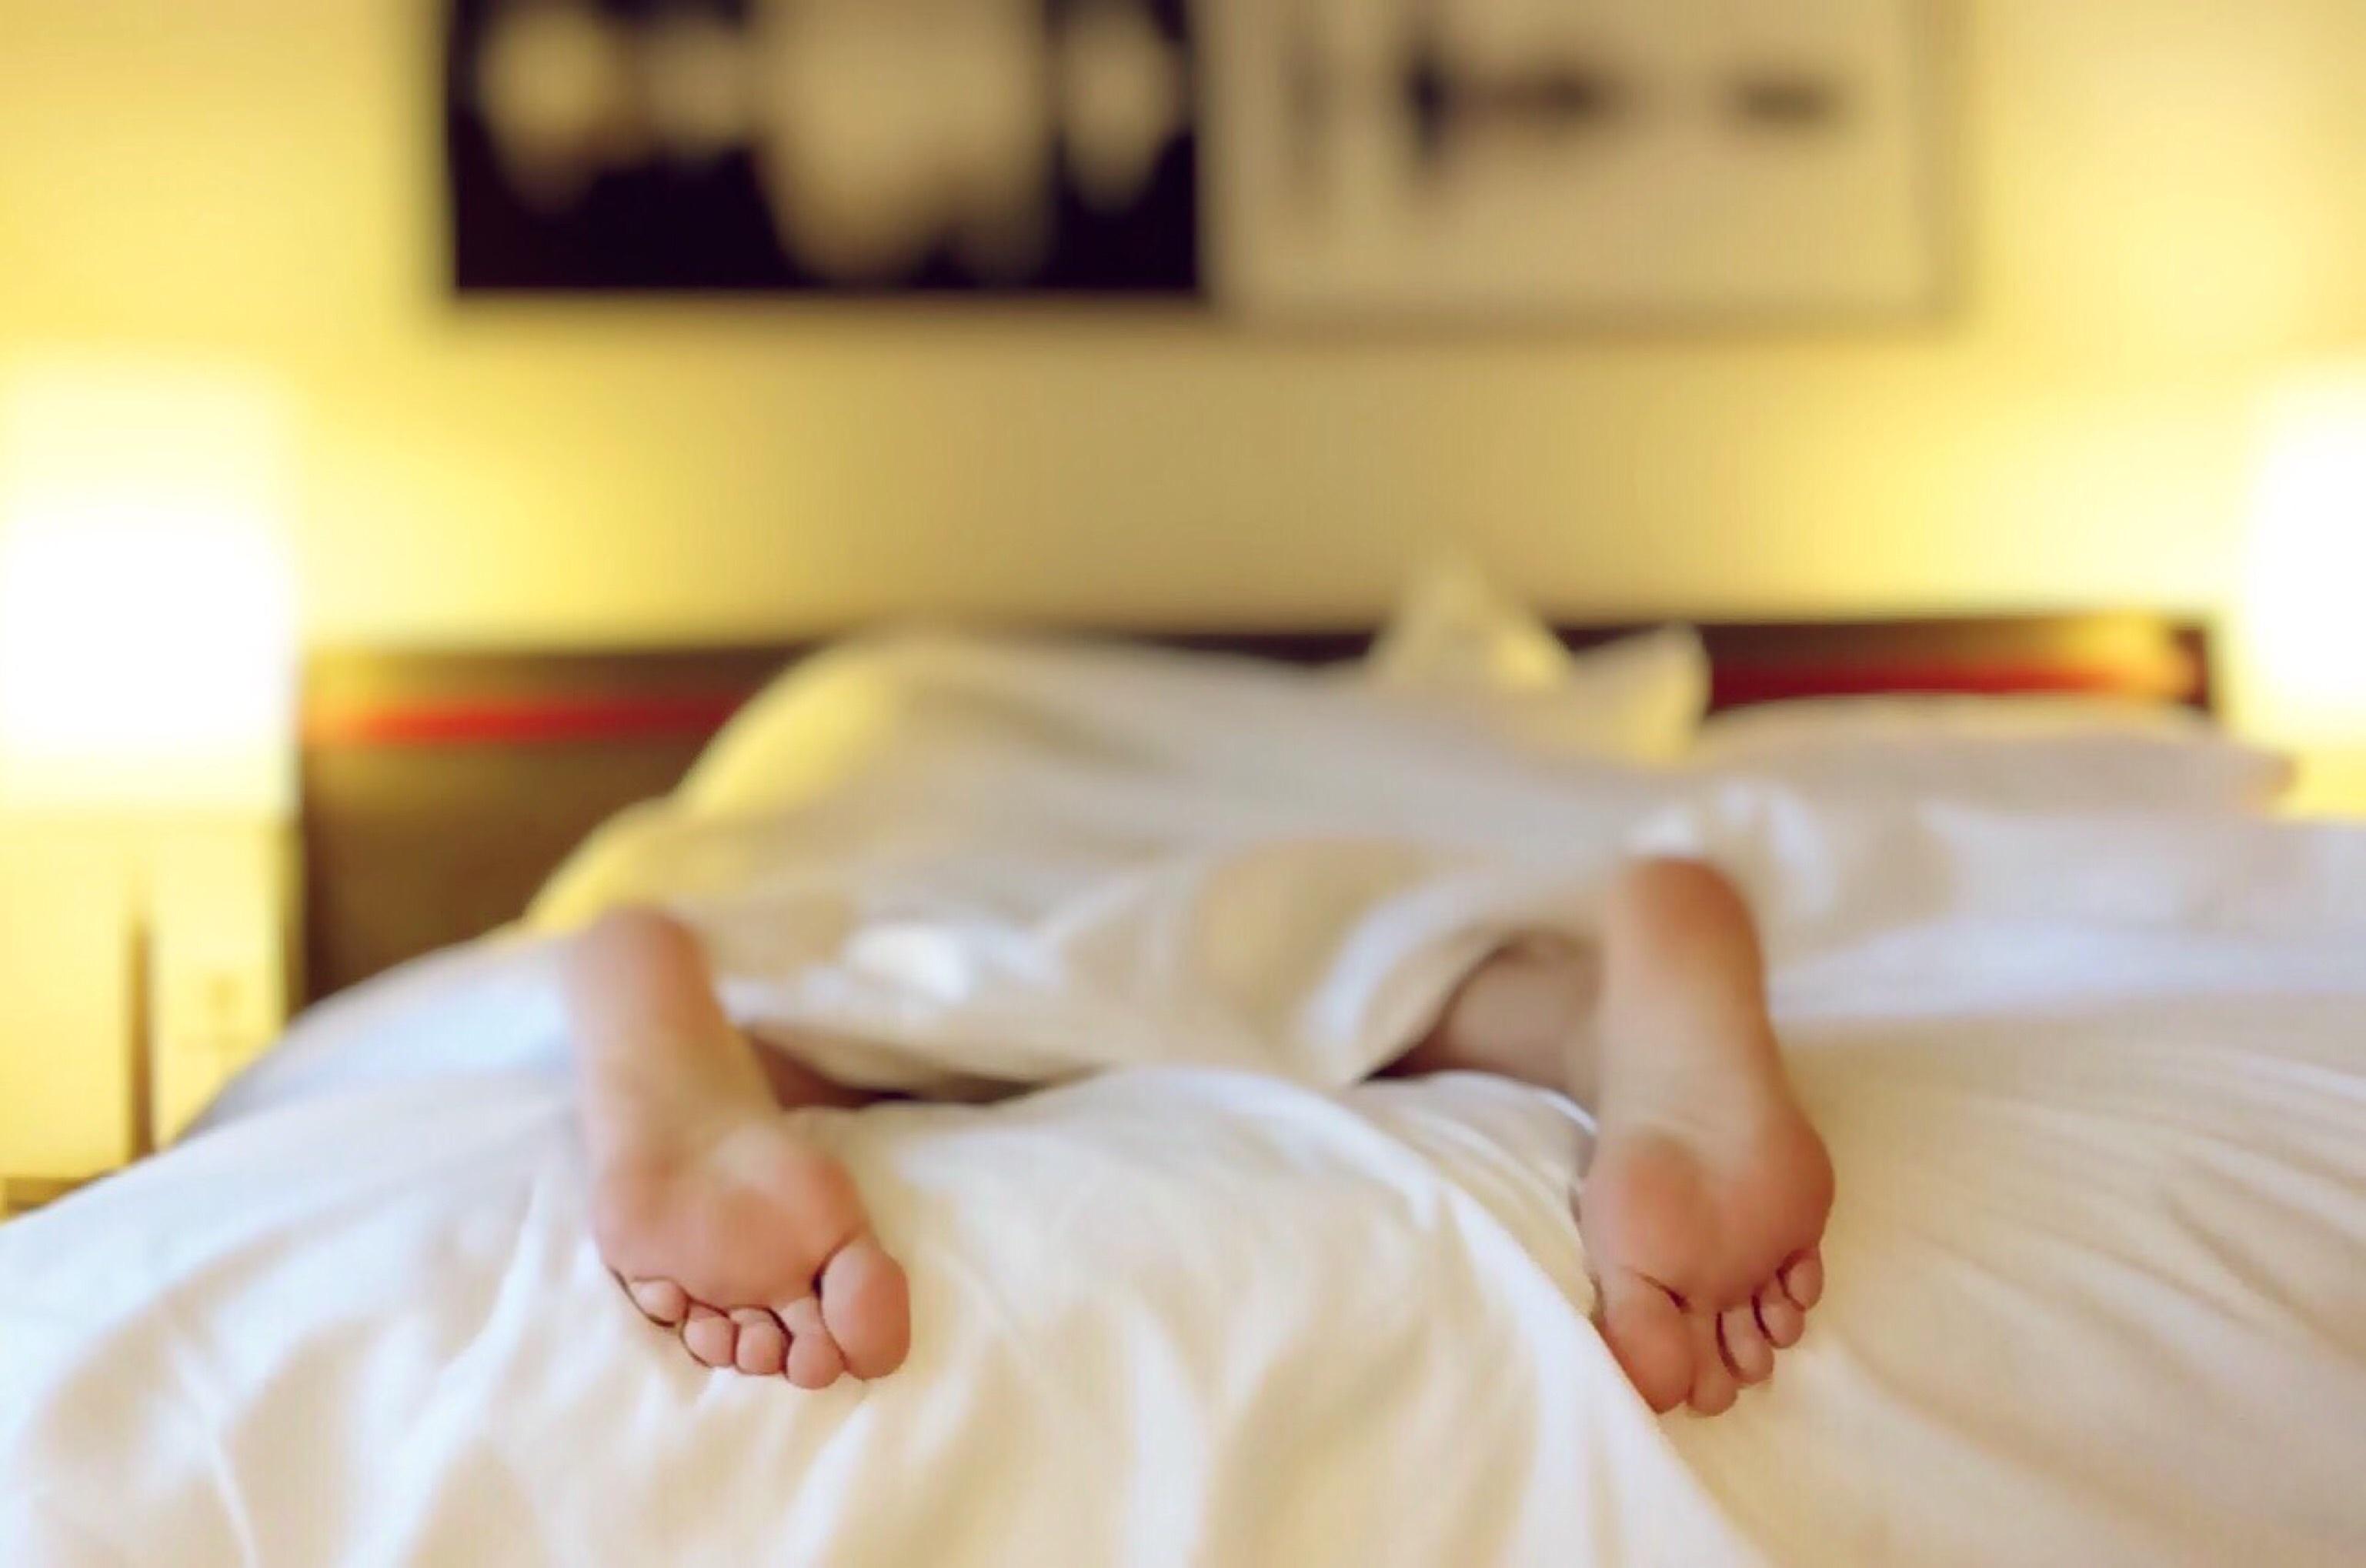 Having a sleep apnea